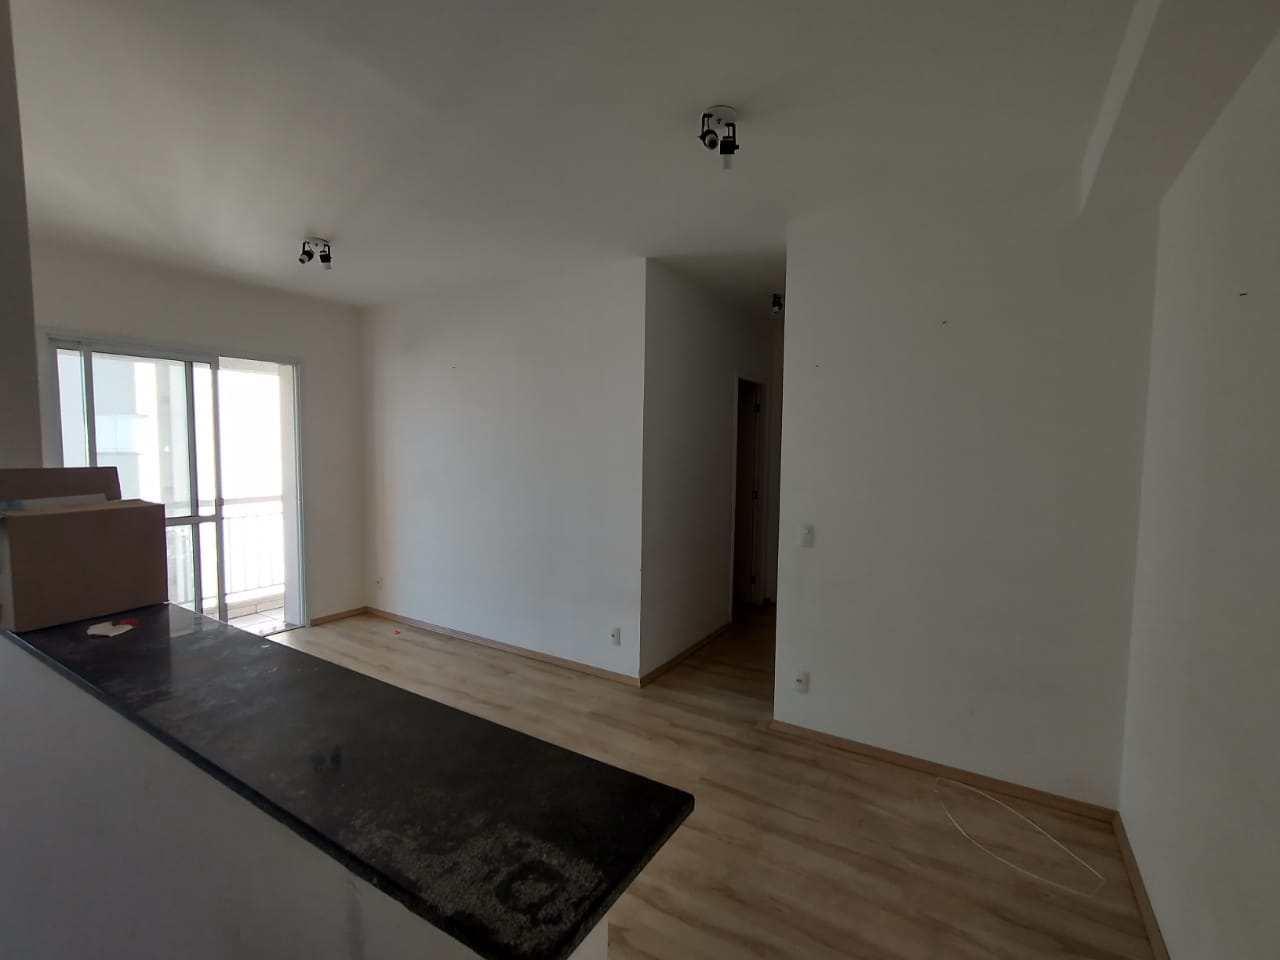 Apartamento com 3 dorms, Jardim Iracema, Barueri - R$ 402 mil, Cod: 1170